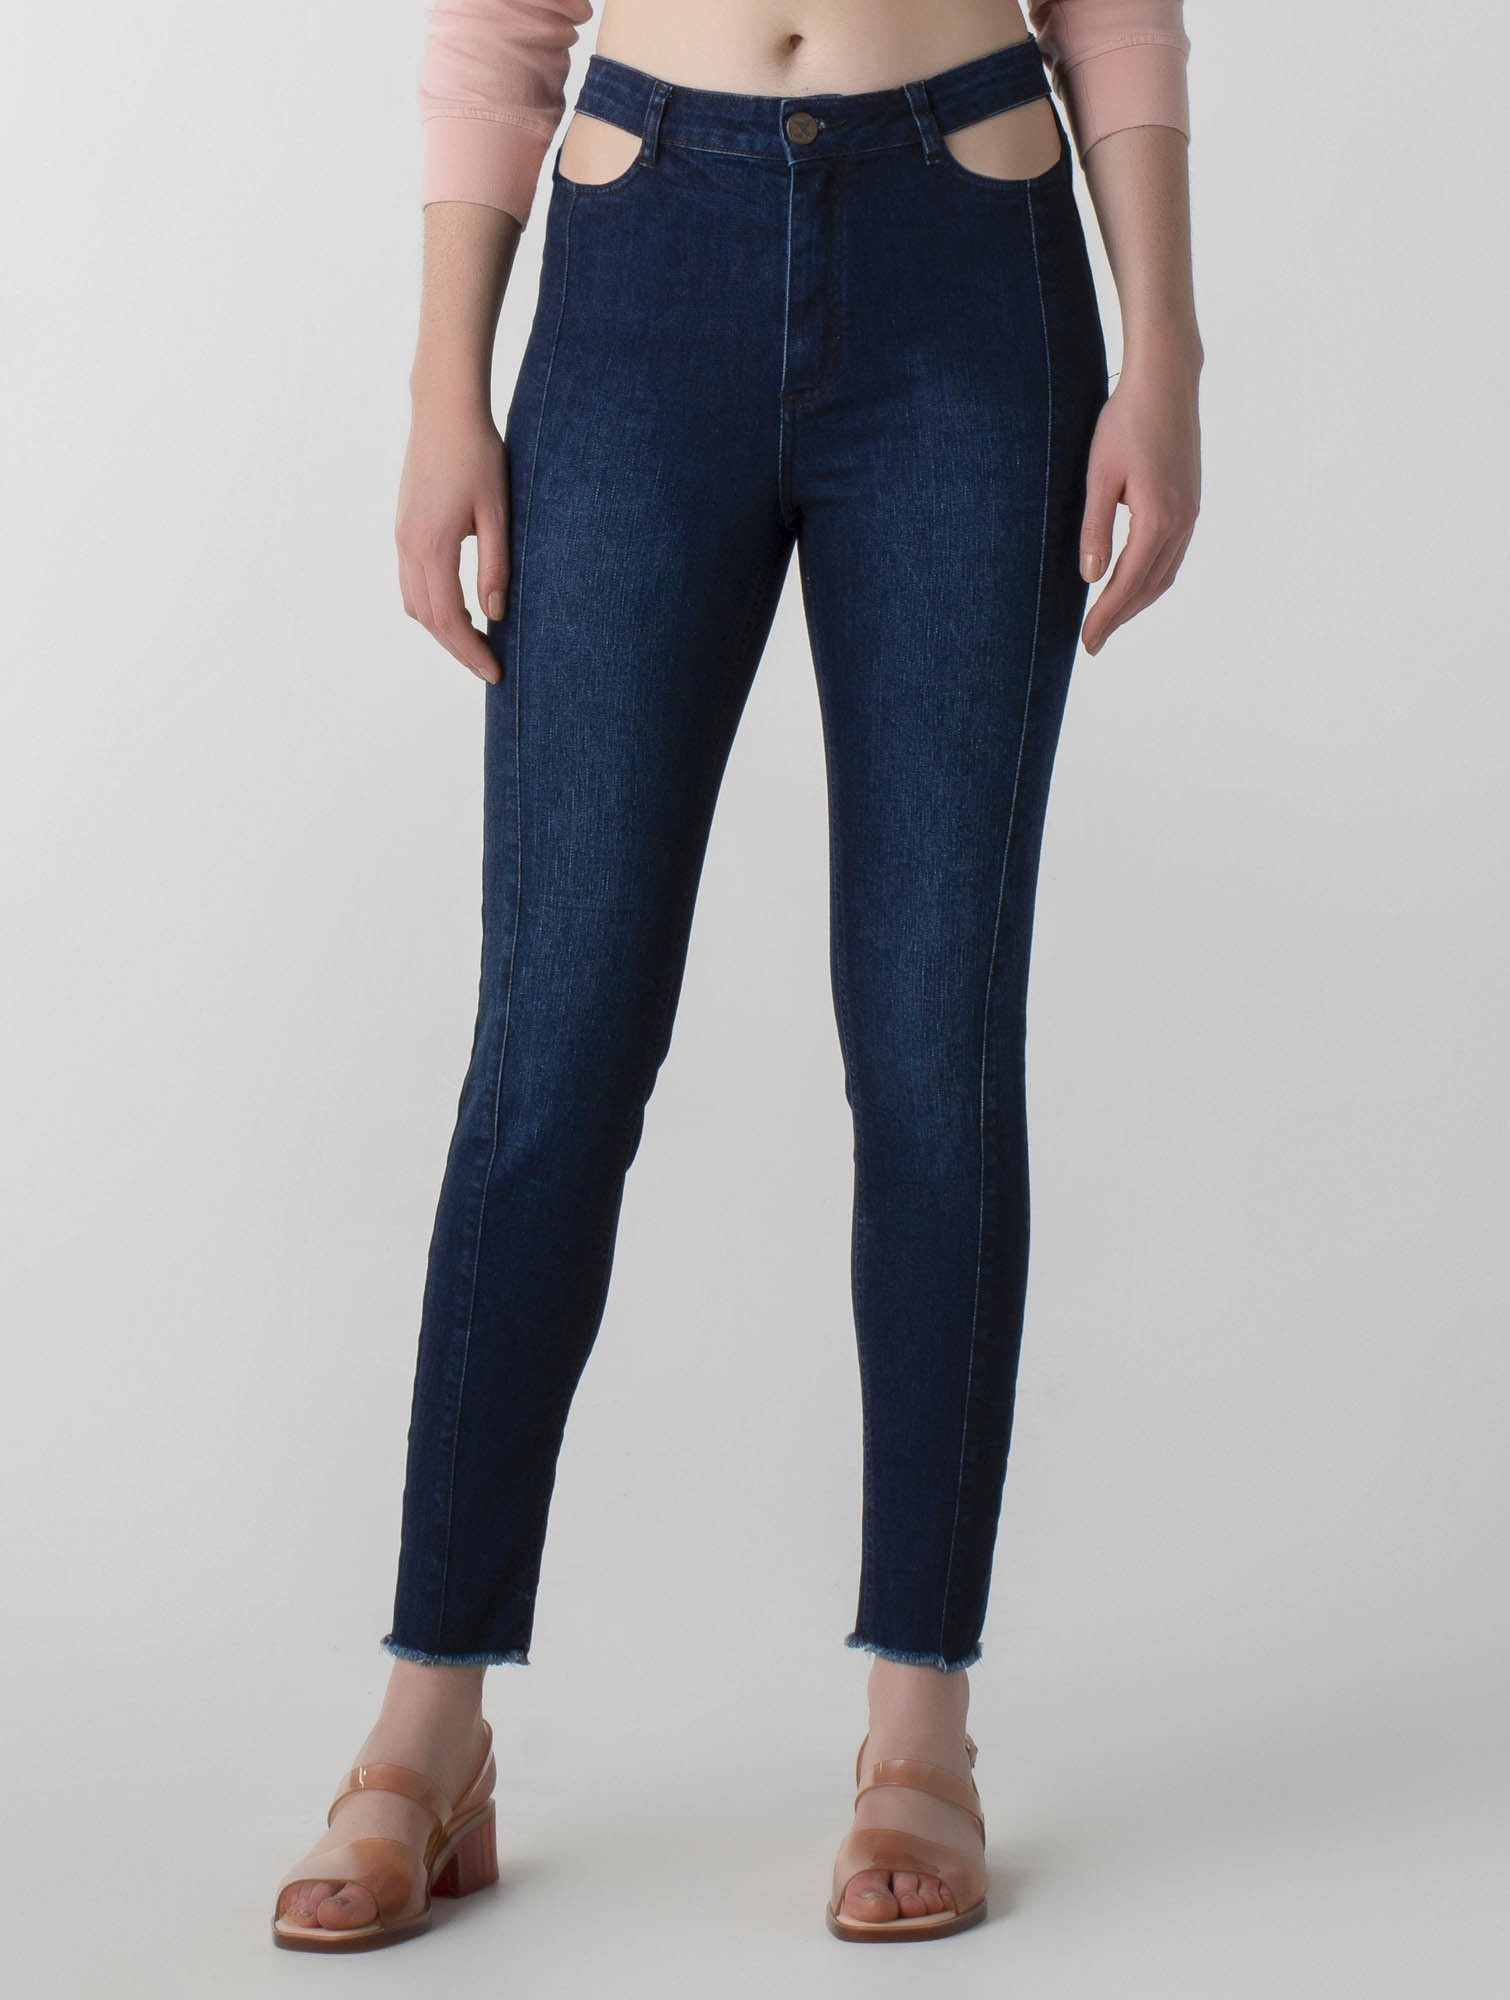 Calça jeans skinny push up - Wave